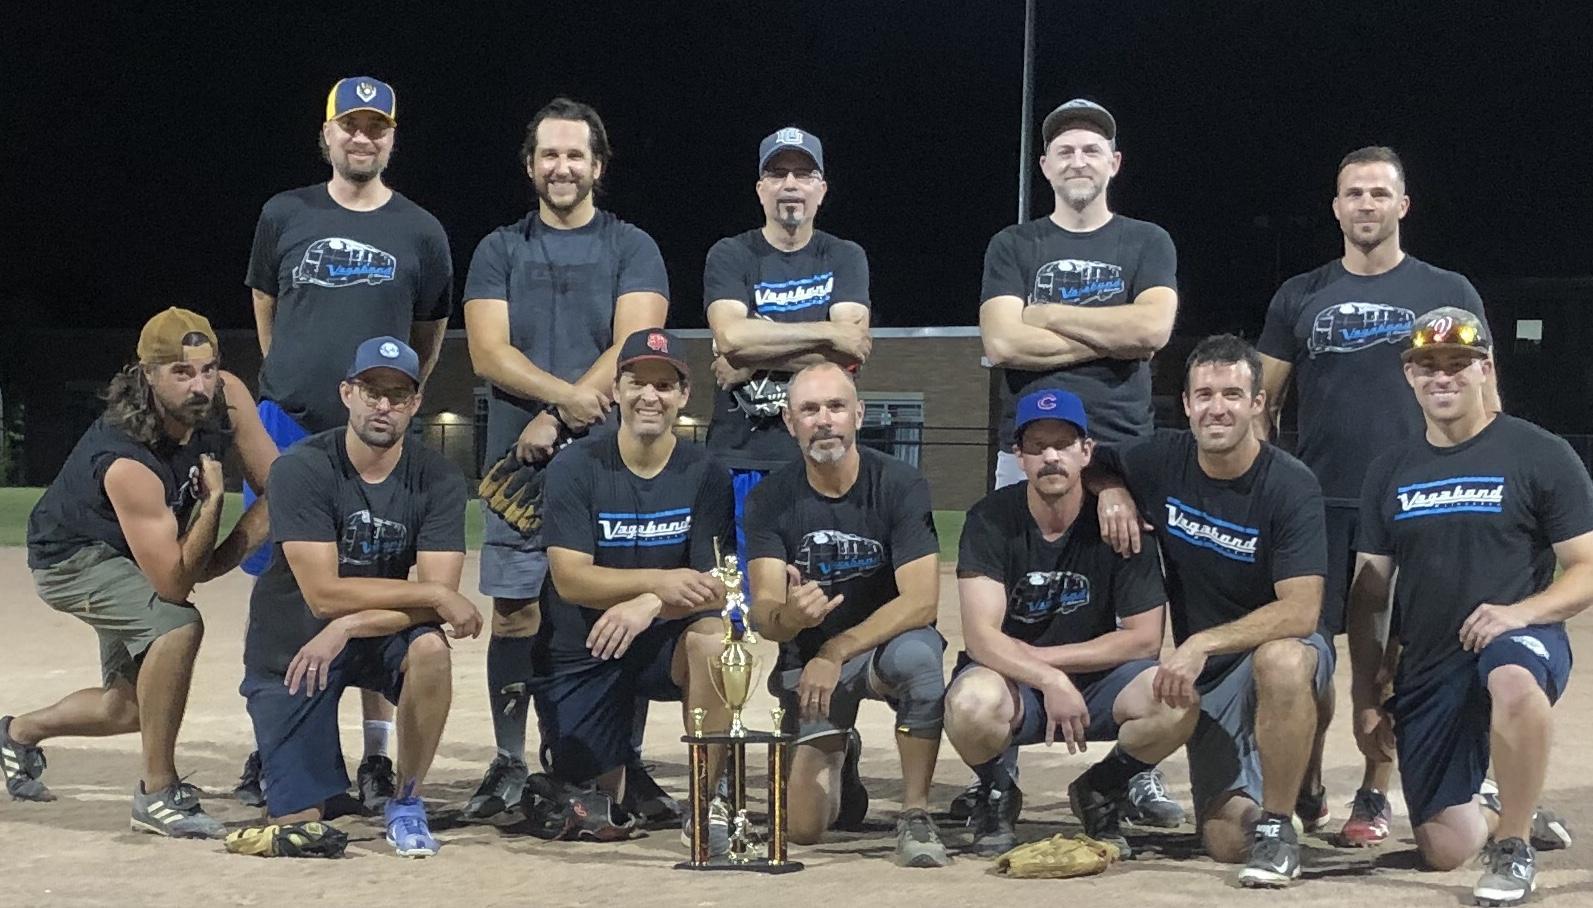 Adult Softball 30+ Champions